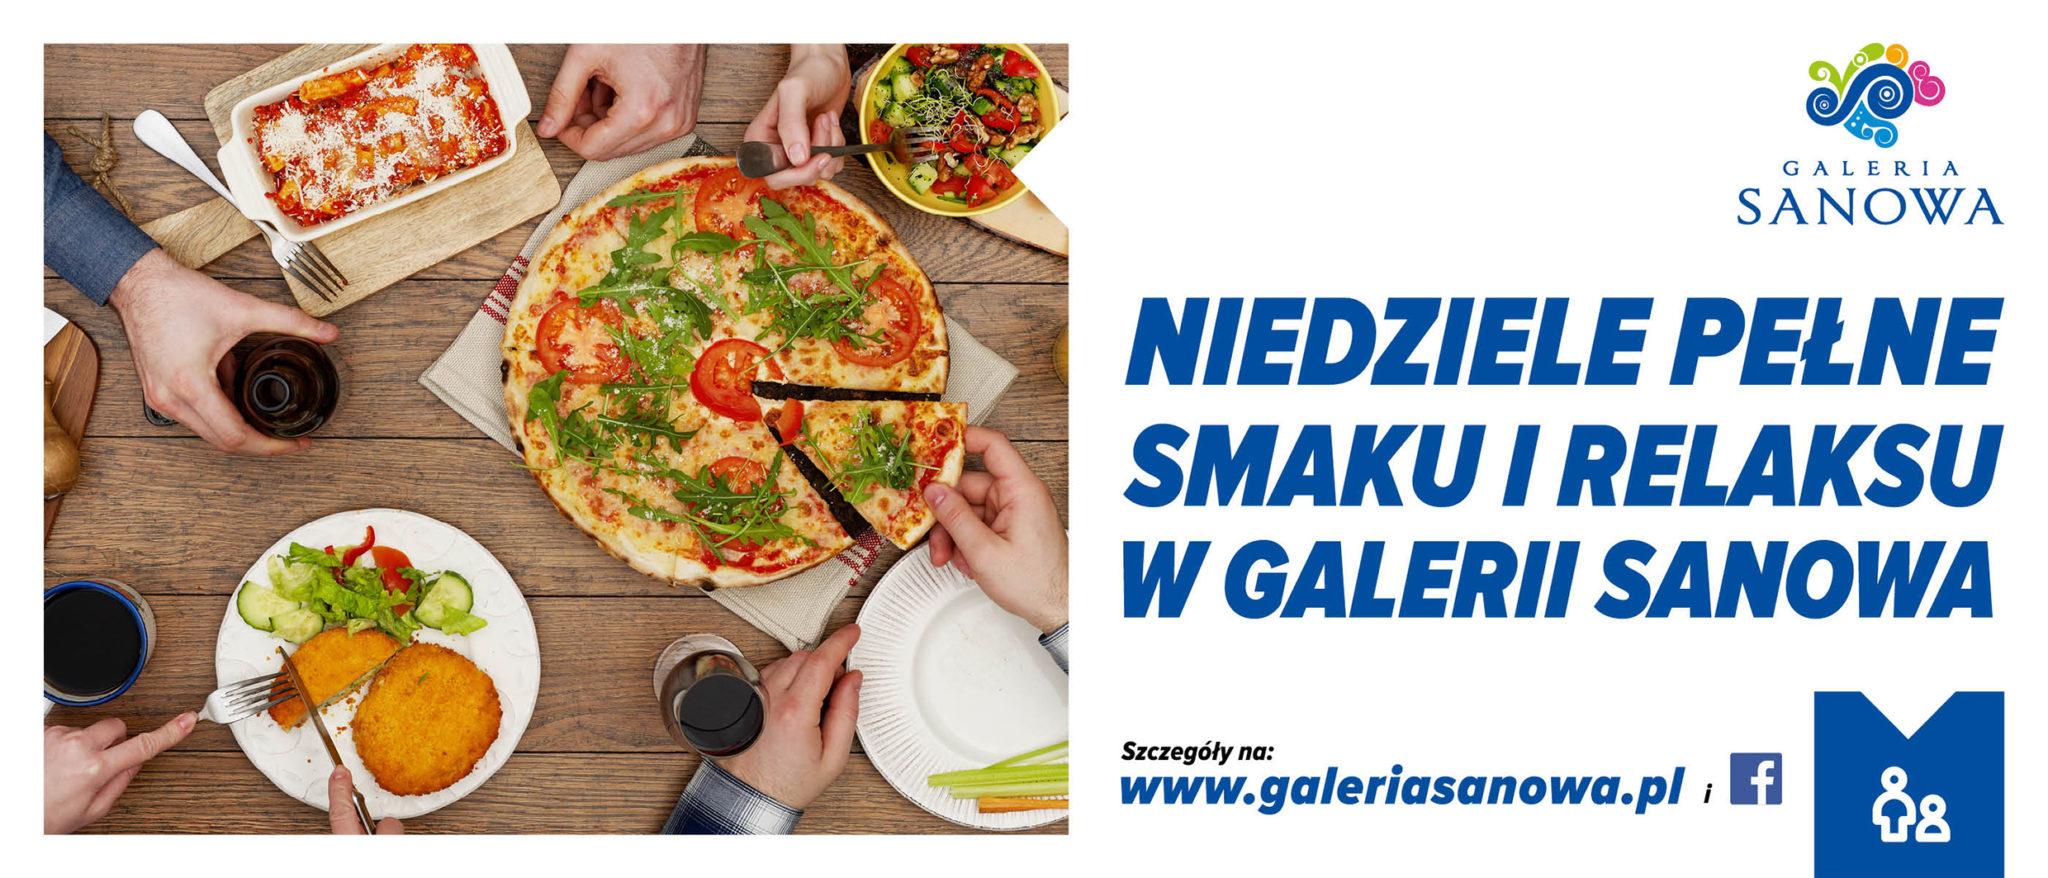 Торгова галерея Galeria Sanowa  c439ae28828a8